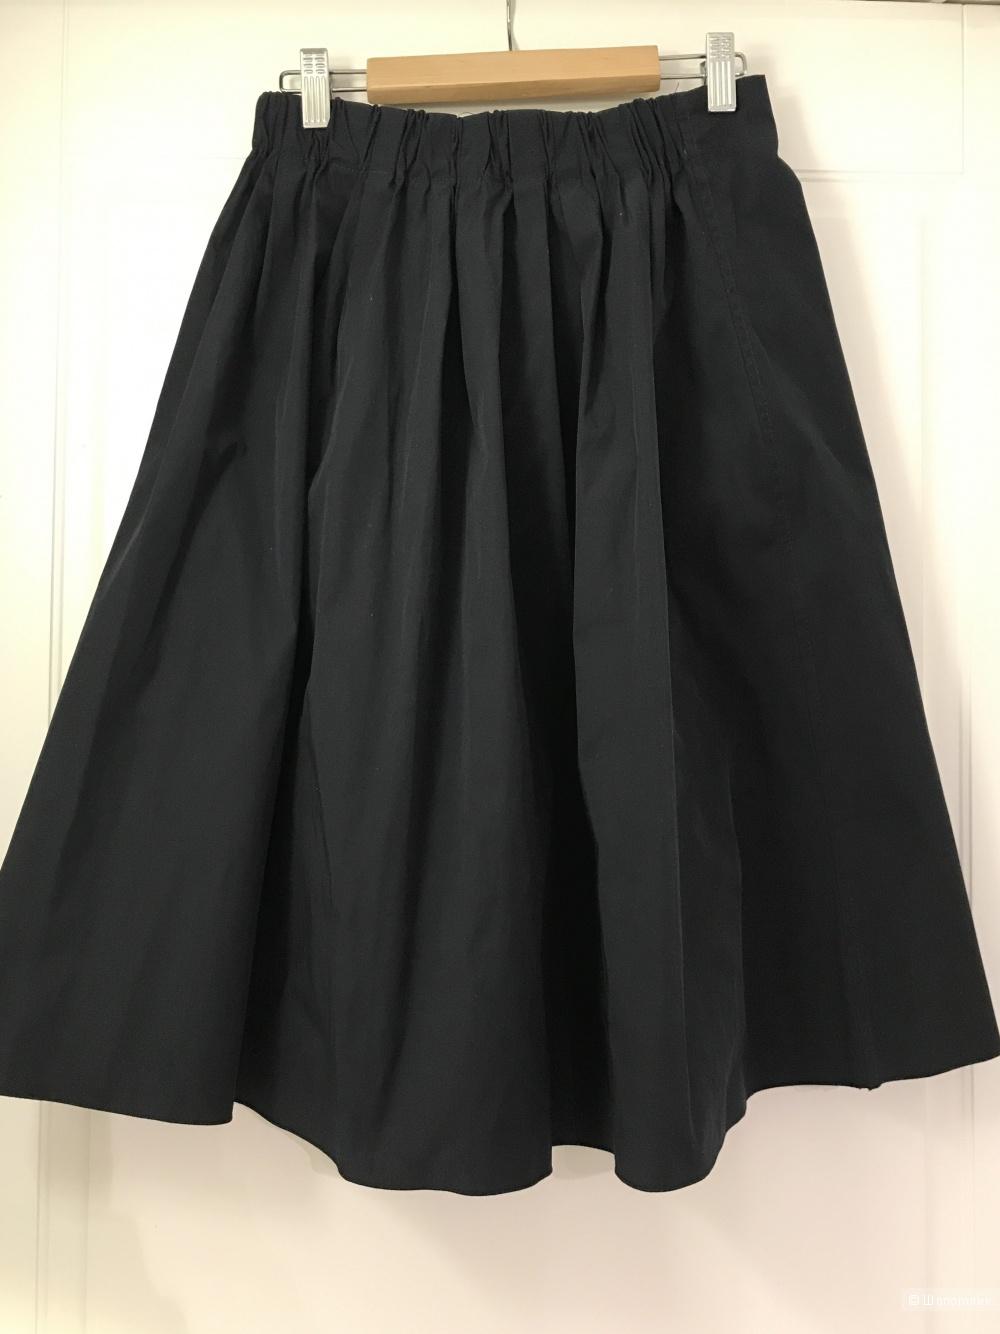 Темно-синяя юбка Zara размер S